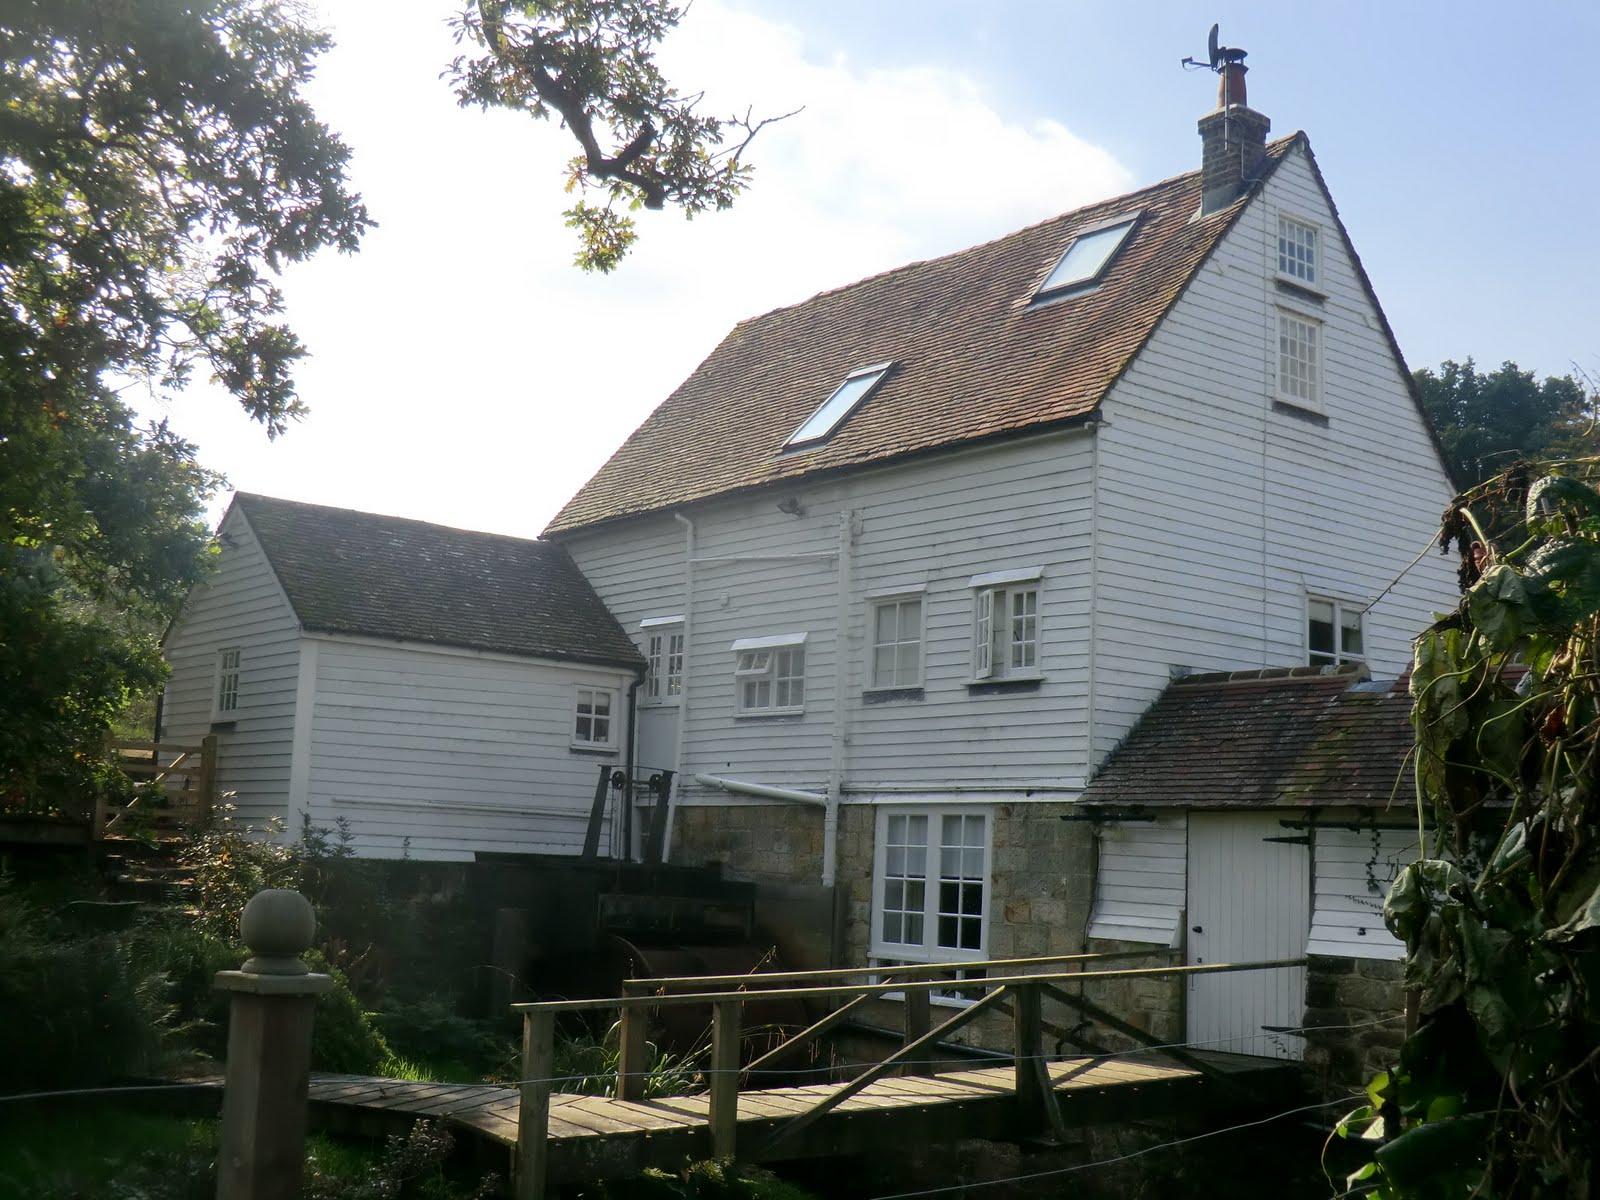 CIMG0809 Newbridge Mill